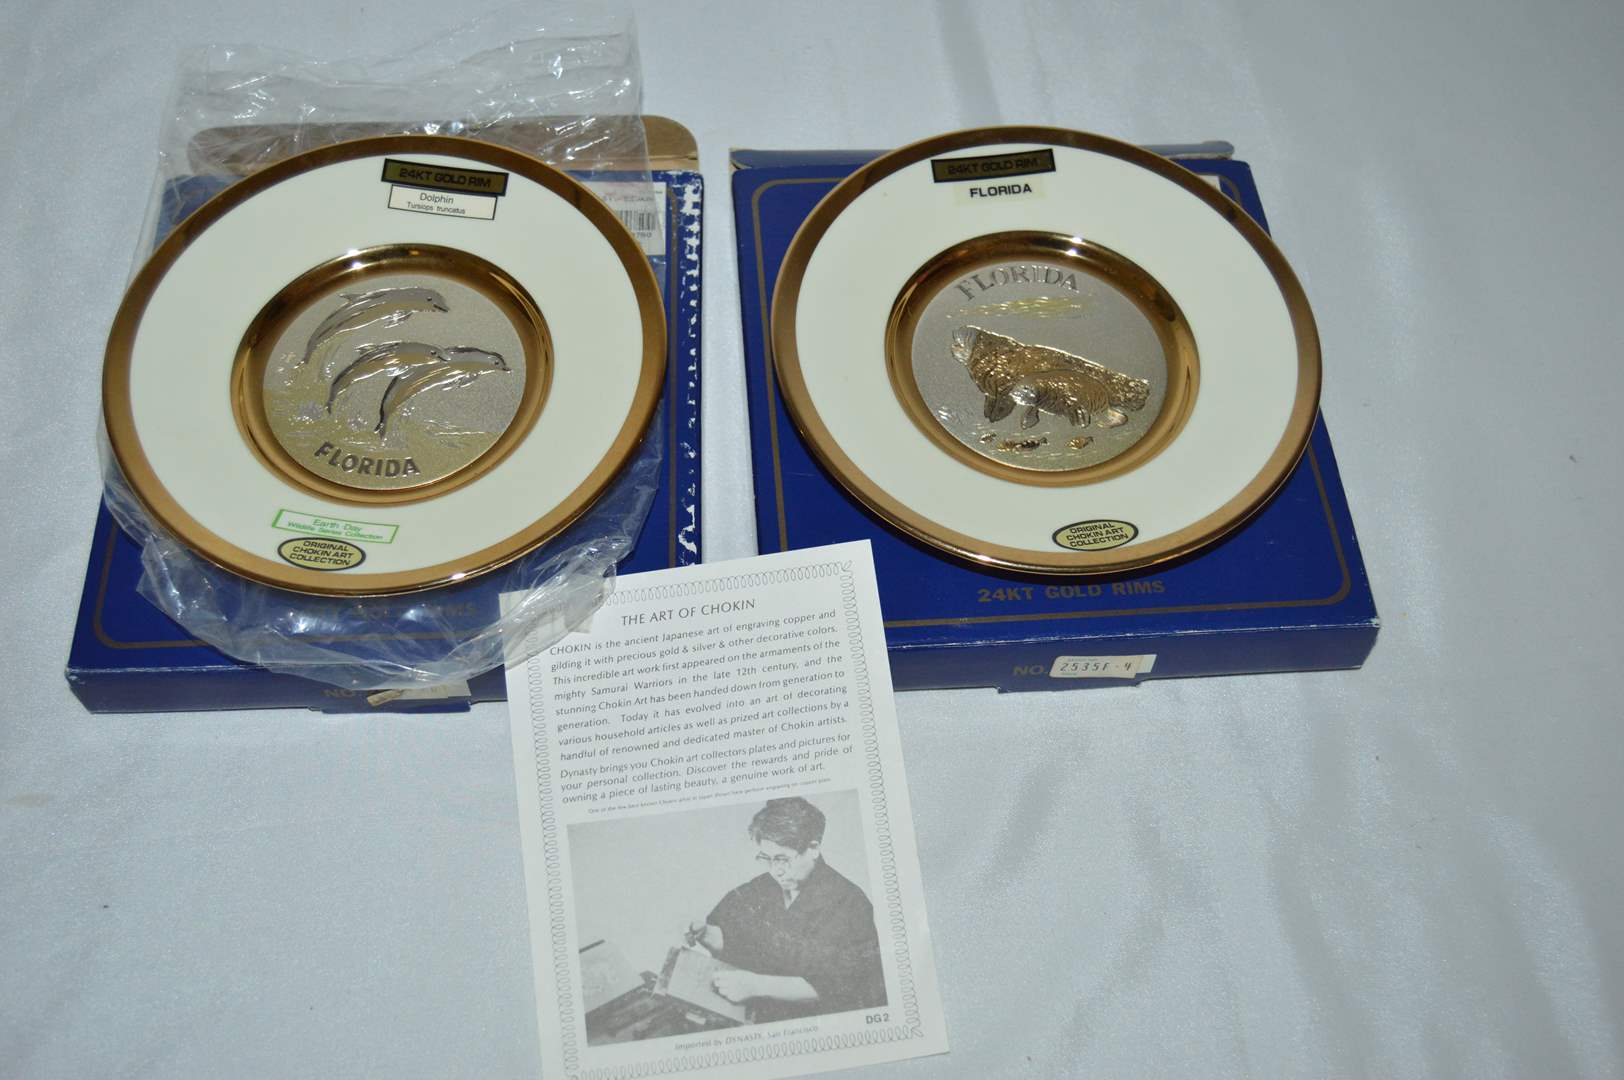 Lot # 144 2 Dynasty Chokin plates w/ boxes and paperwork - Dolphin & Florida Manatees (main image)